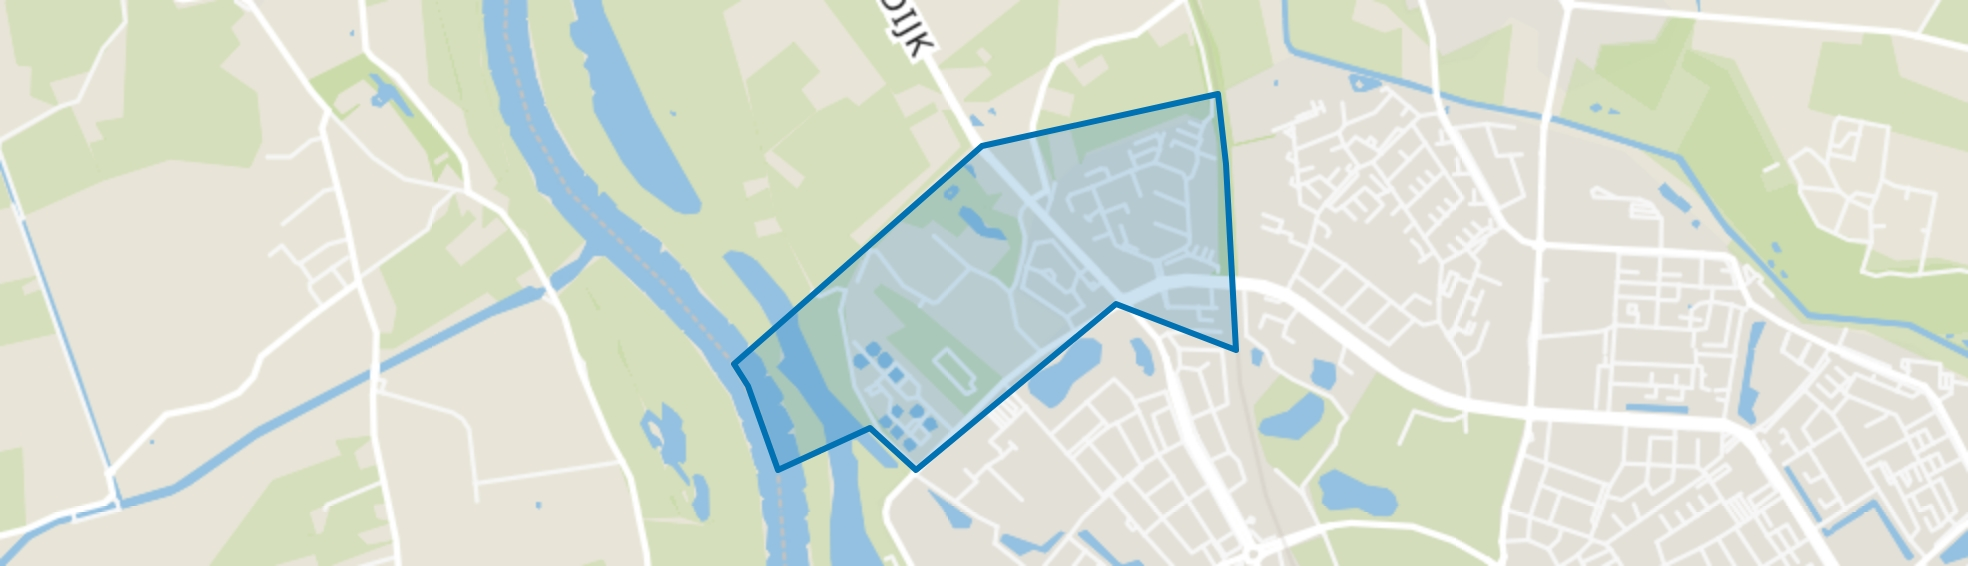 Platvoet, Deventer map